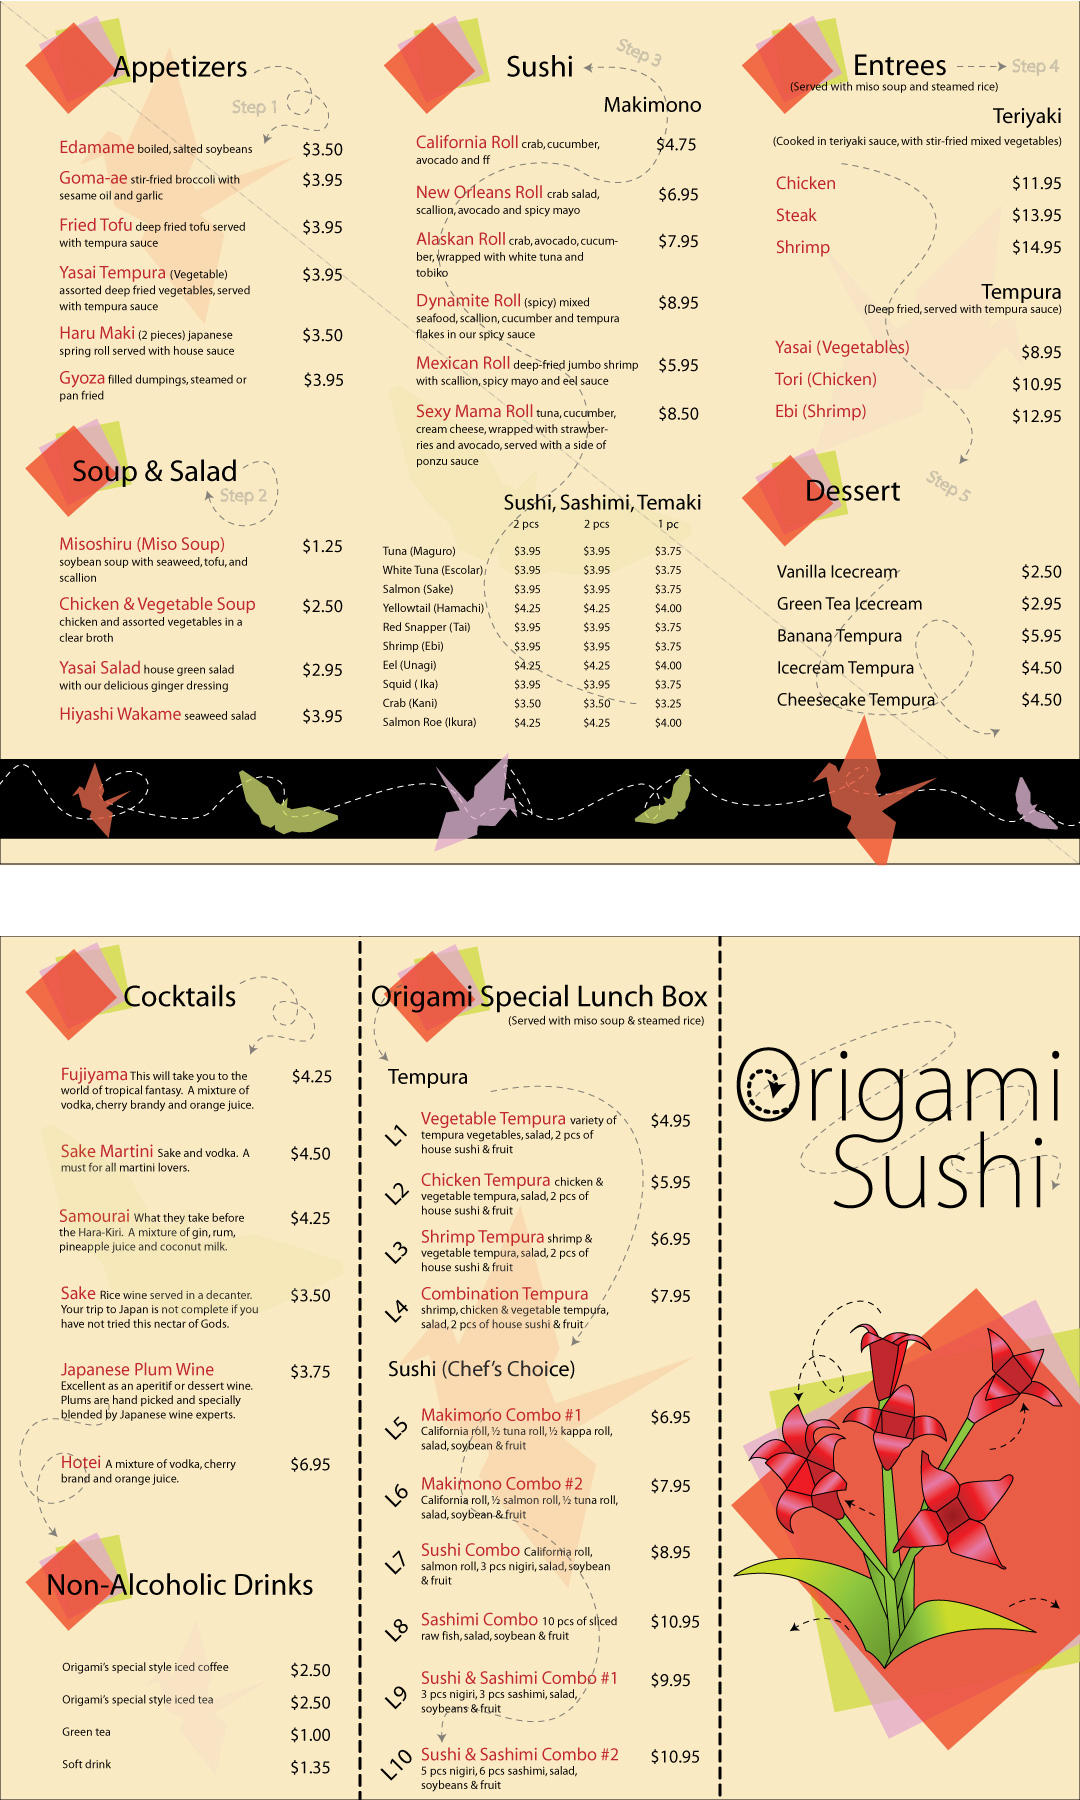 origami sushi restaurant | Tutorial Origami Handmade - photo#14